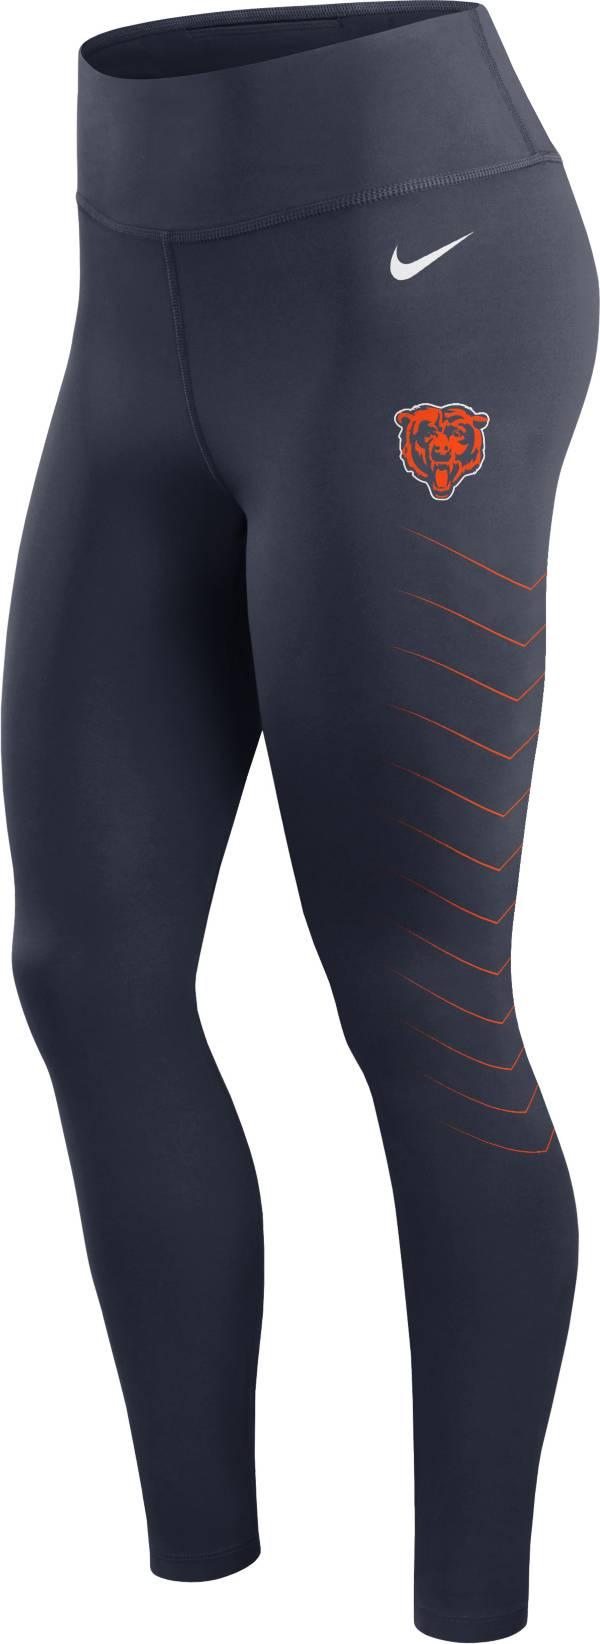 Nike Women's Chicago Bears Dri-FIT Navy Performance Leggings product image